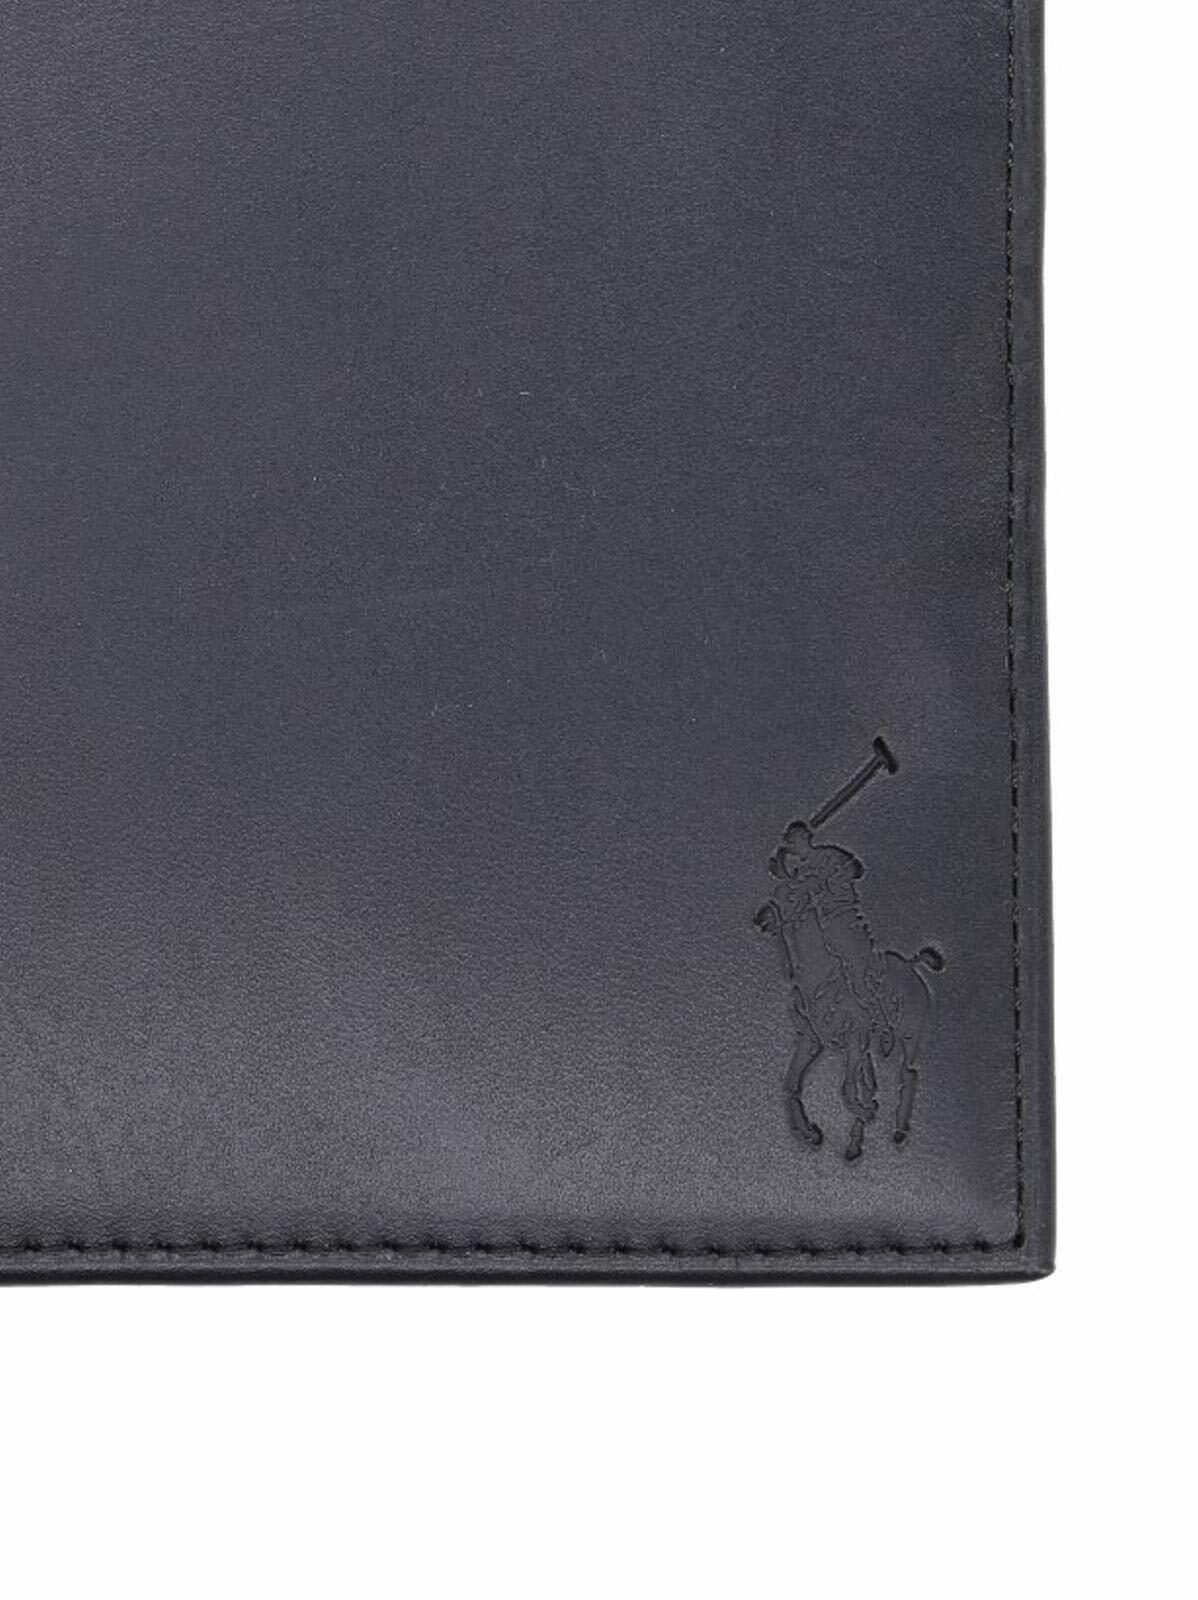 Polo Ralph Lauren Smooth Leather Billfold Wallet, Black BNWT (RRP )